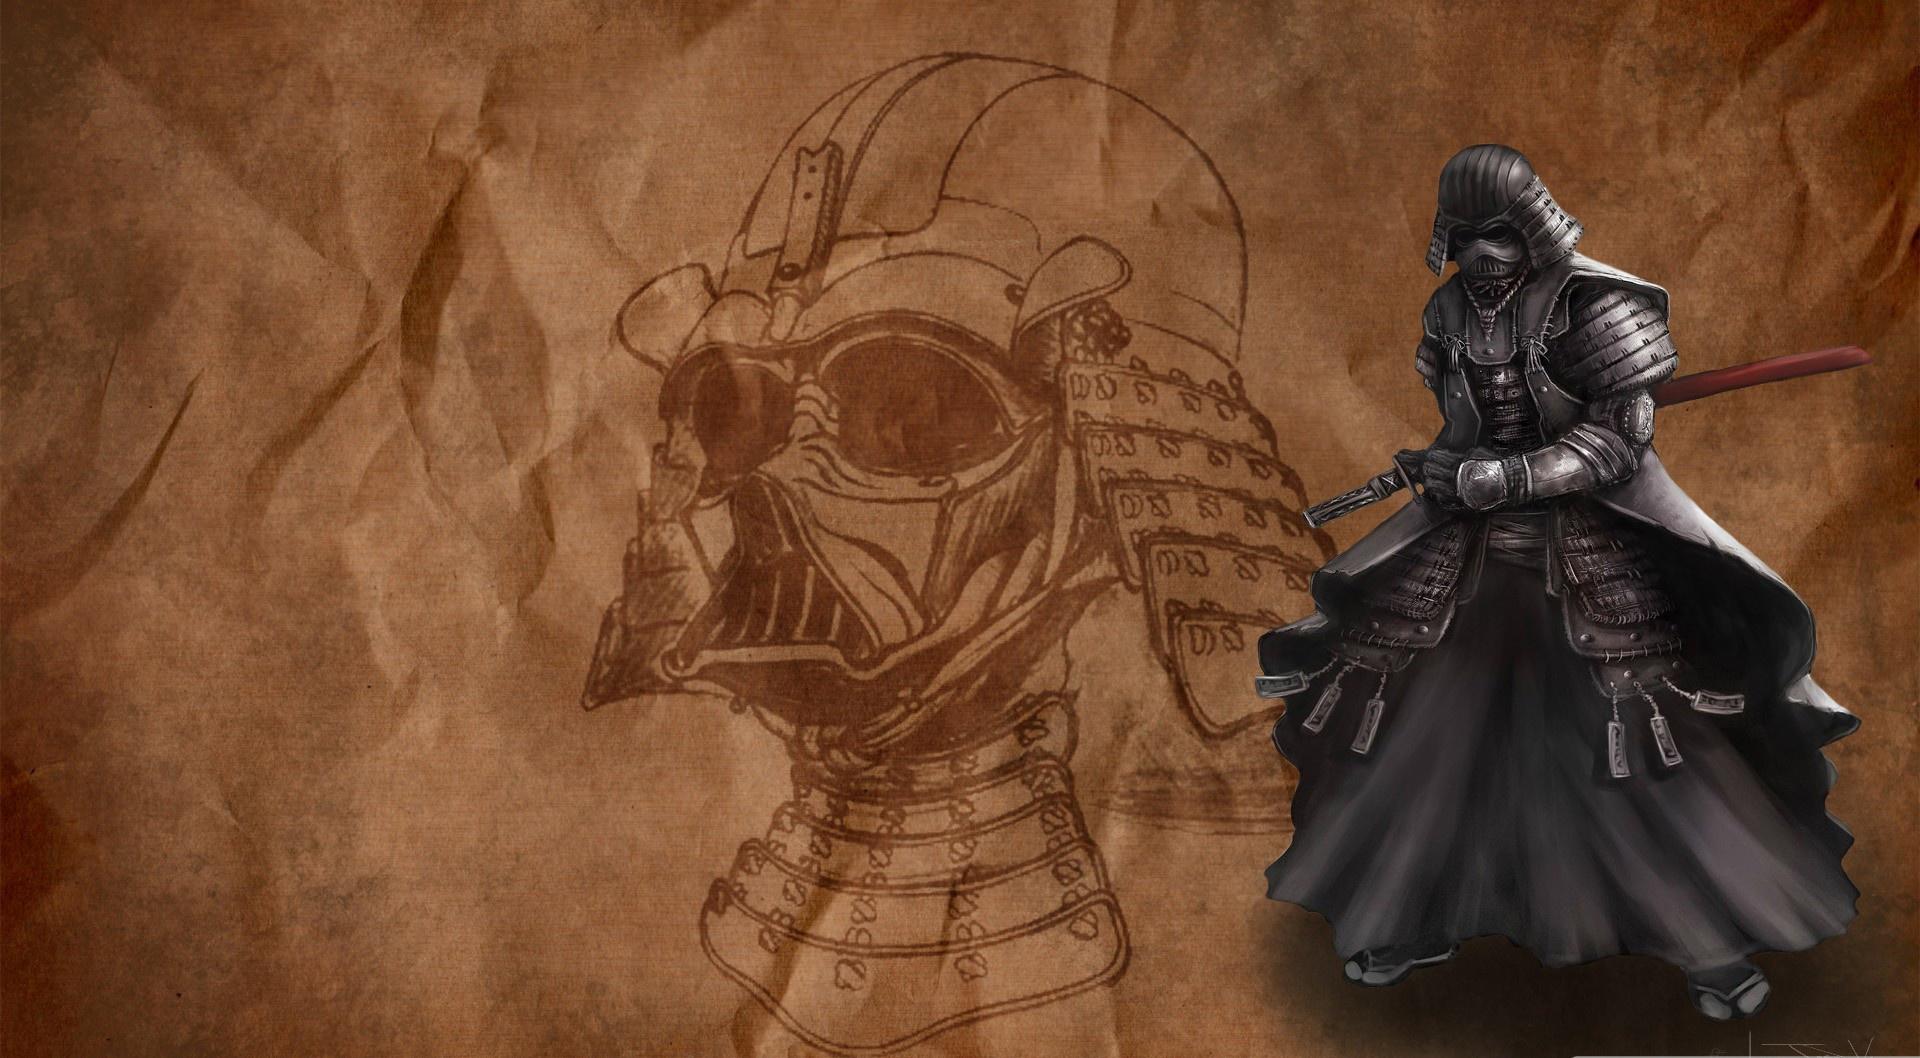 Shogun 2 Fall Of The Samurai Wallpaper Samurai Backgrounds Free Download Pixelstalk Net